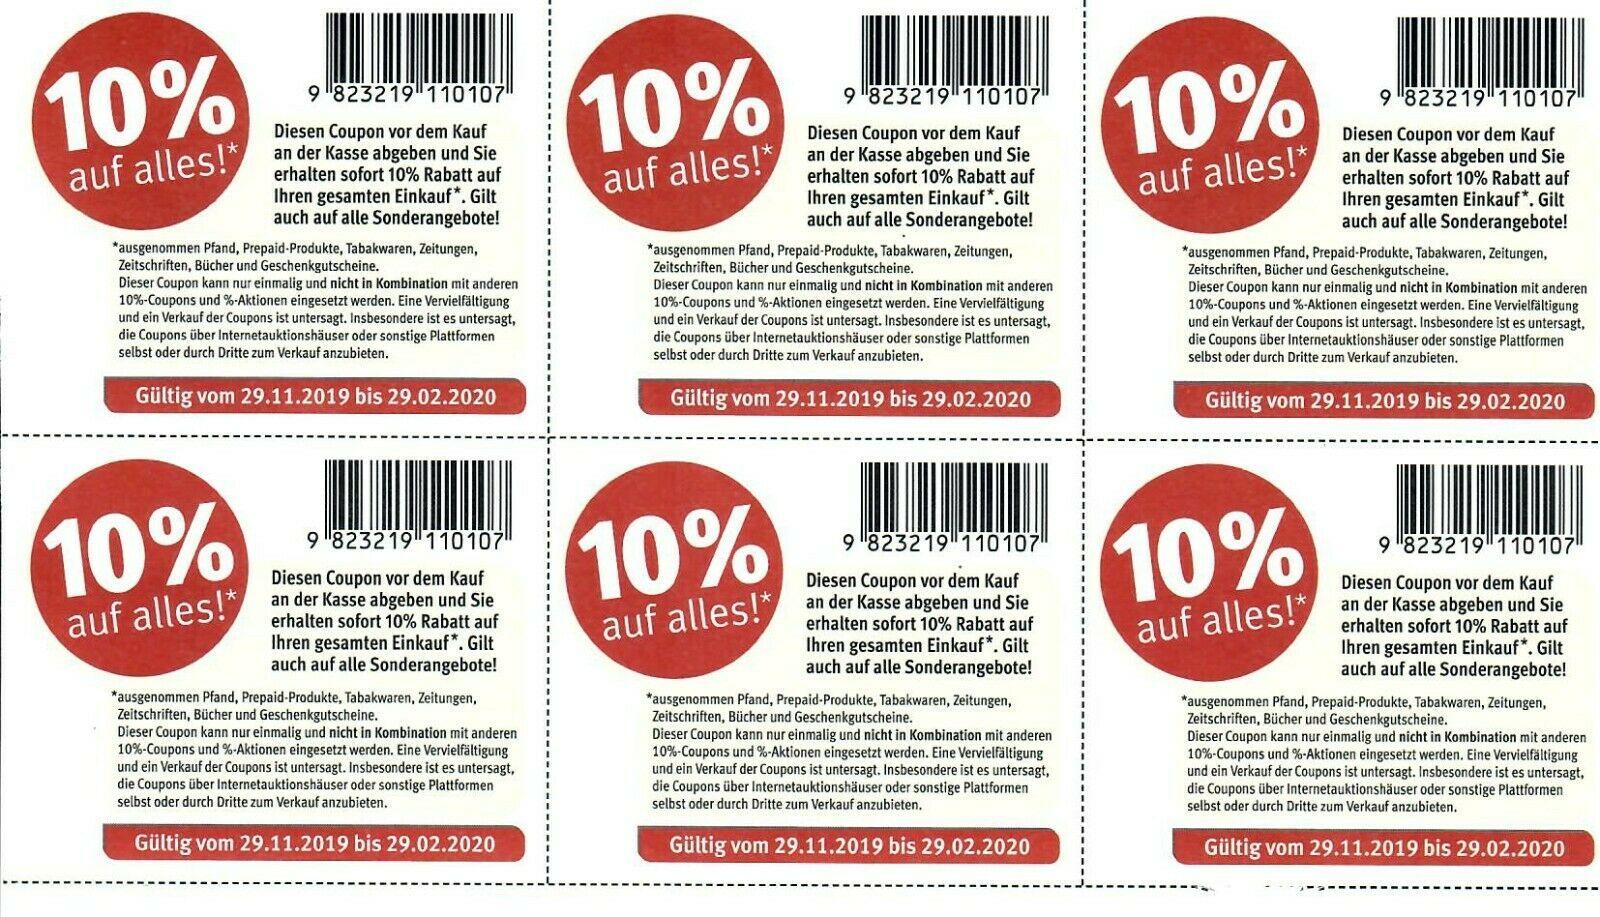 rossmann 10 coupon